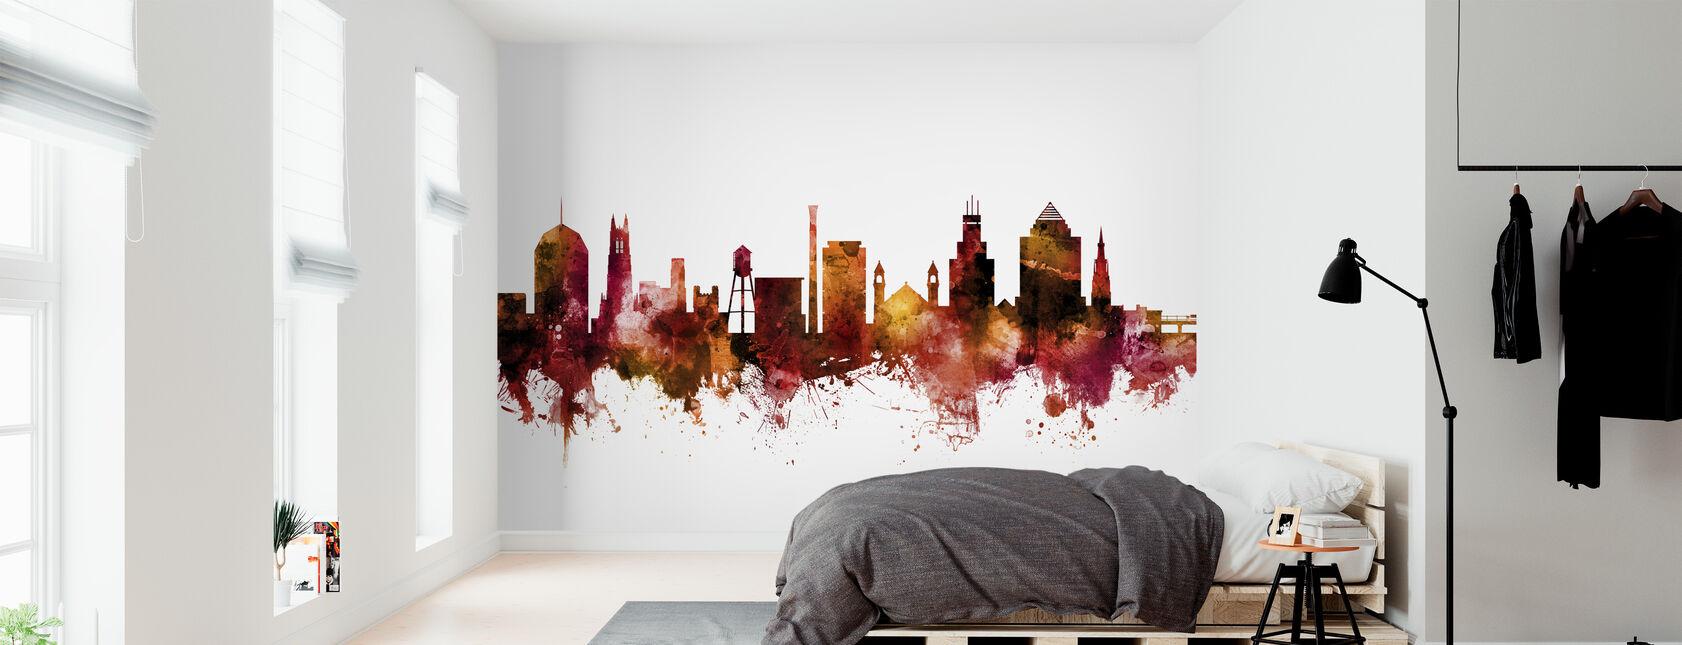 Durham North Carolina Skyline - Wallpaper - Bedroom